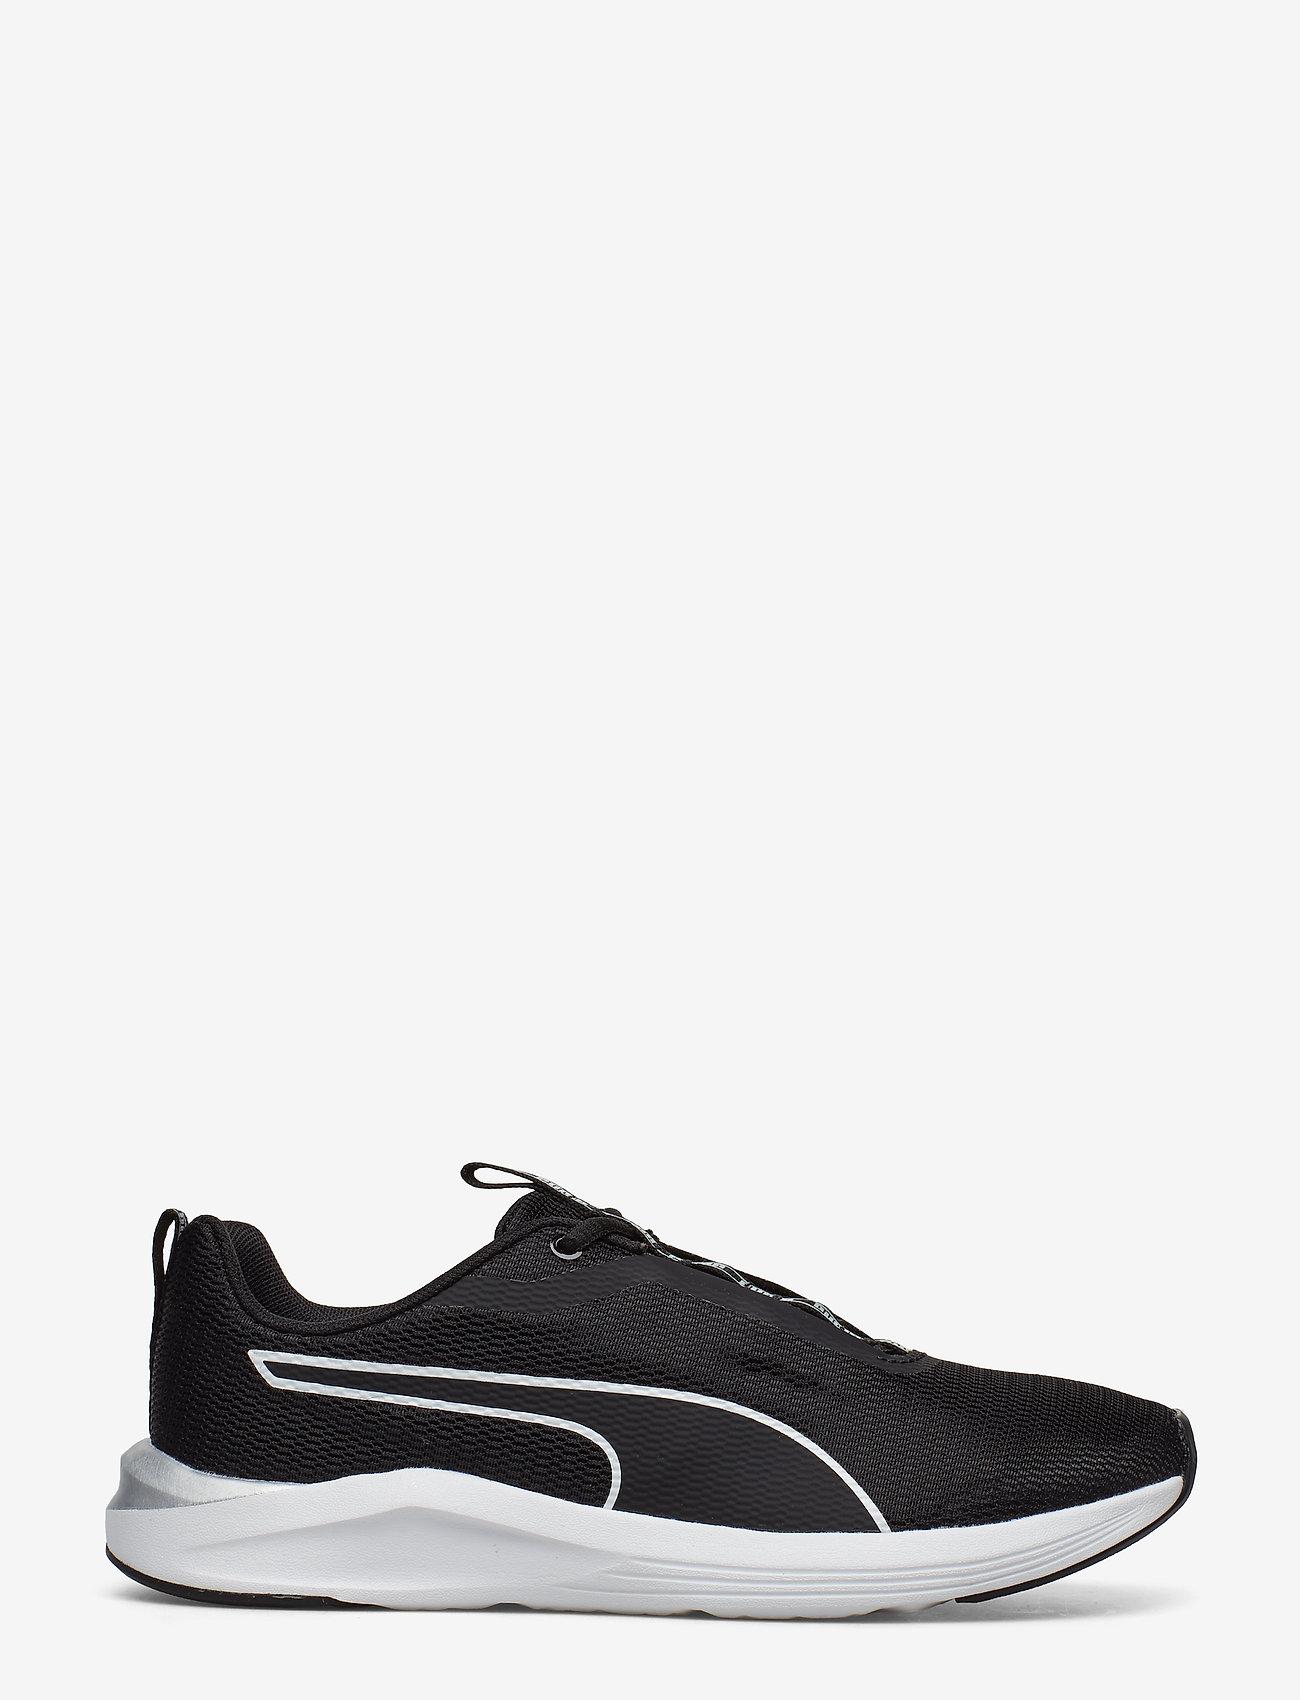 PUMA - Prowl 2 Wn's - training schoenen - puma black-puma white - 1